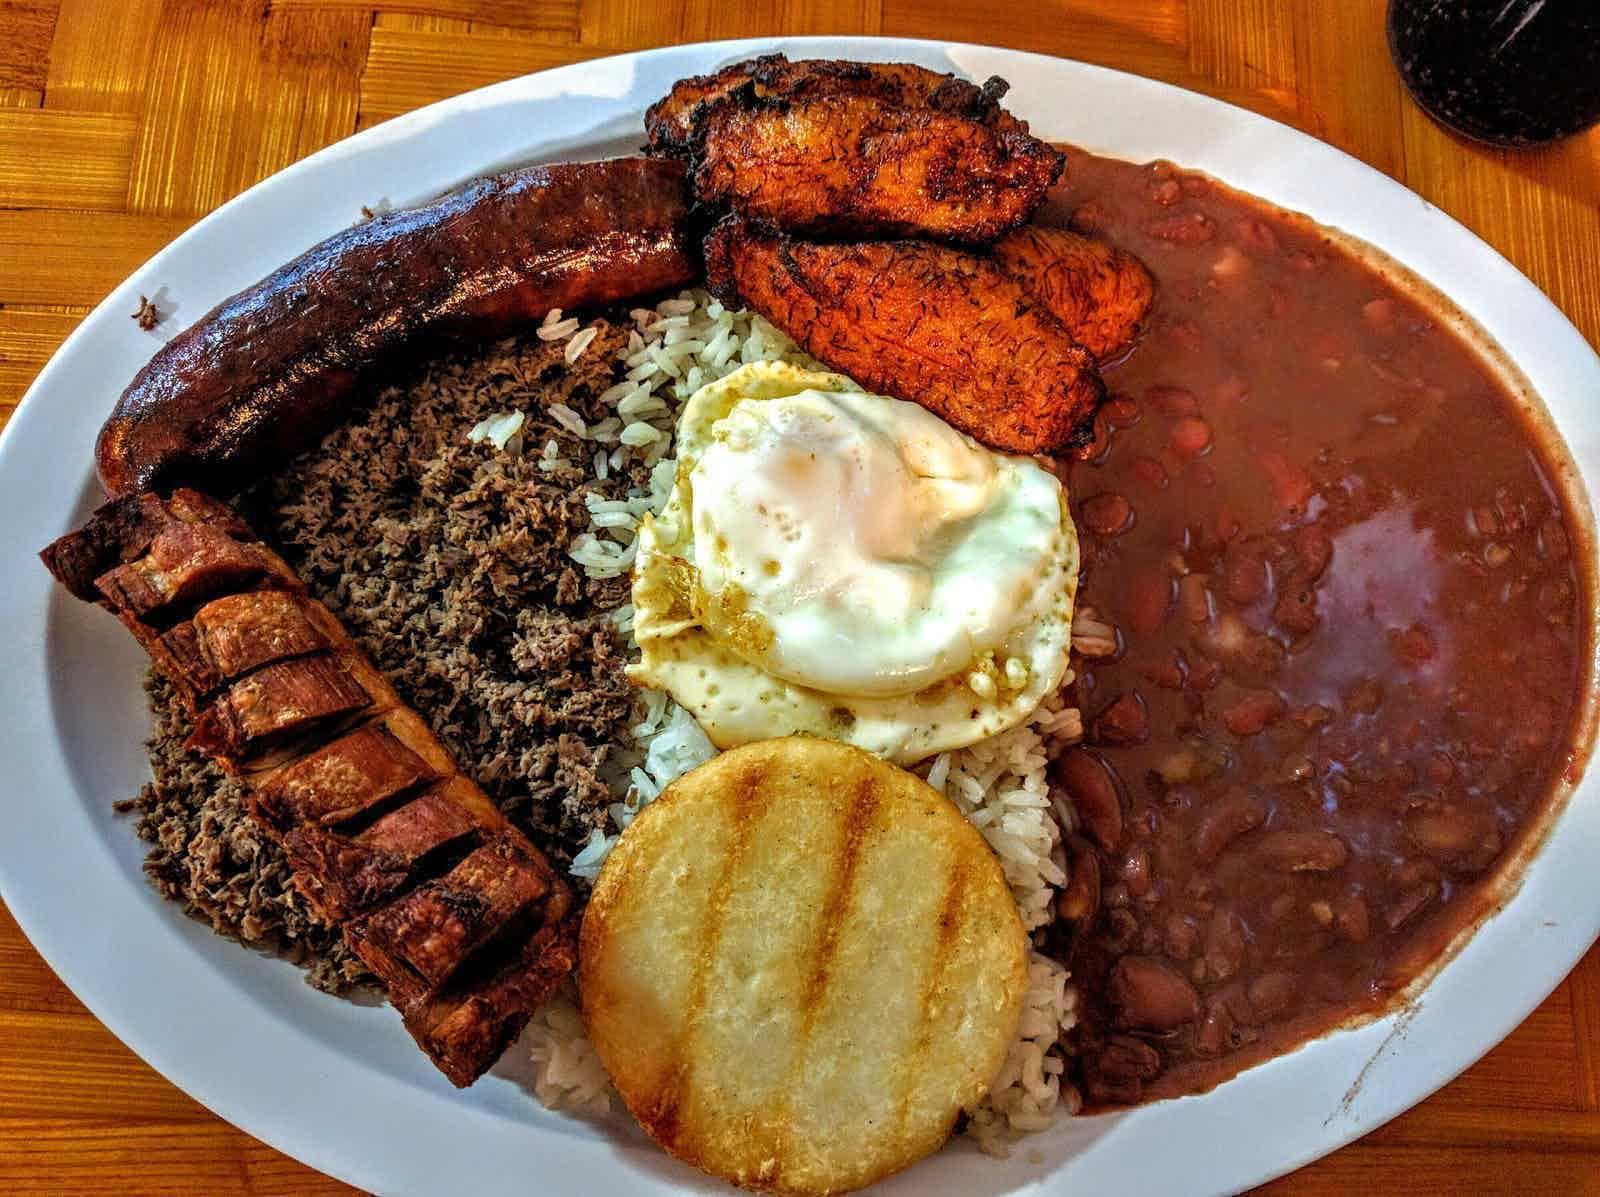 El Patio Colombian Restaurant - Fort Lauderdale | Restaurant Review - Zagat & El Patio Colombian Restaurant - Fort Lauderdale | Restaurant Review ...